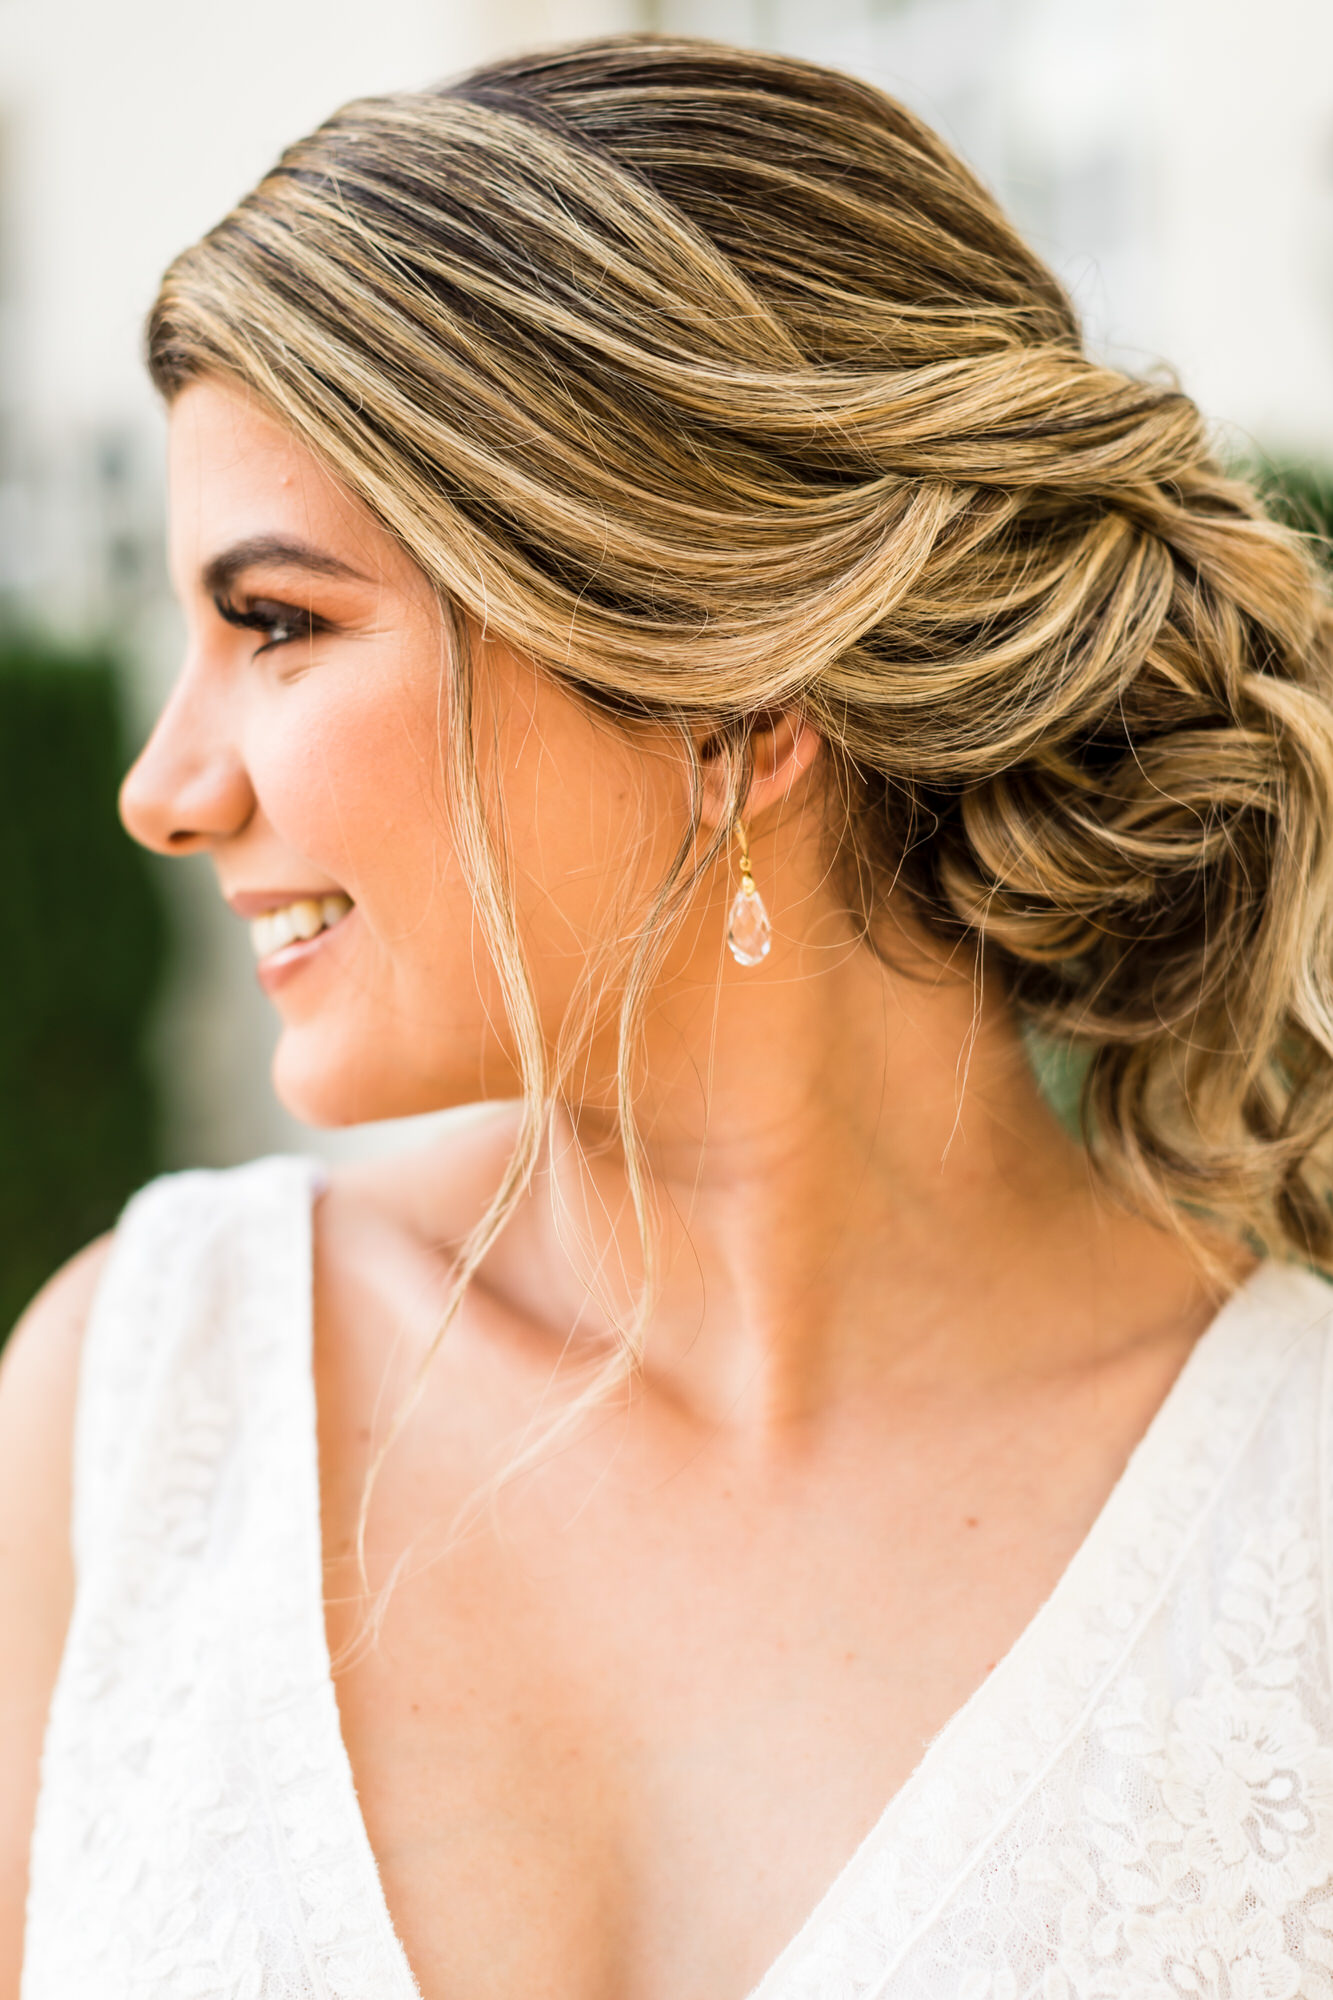 blonde-bride-with-loose-updo-and-crystal-drop-earrings-xiaoqi-li-photography-washington-dc